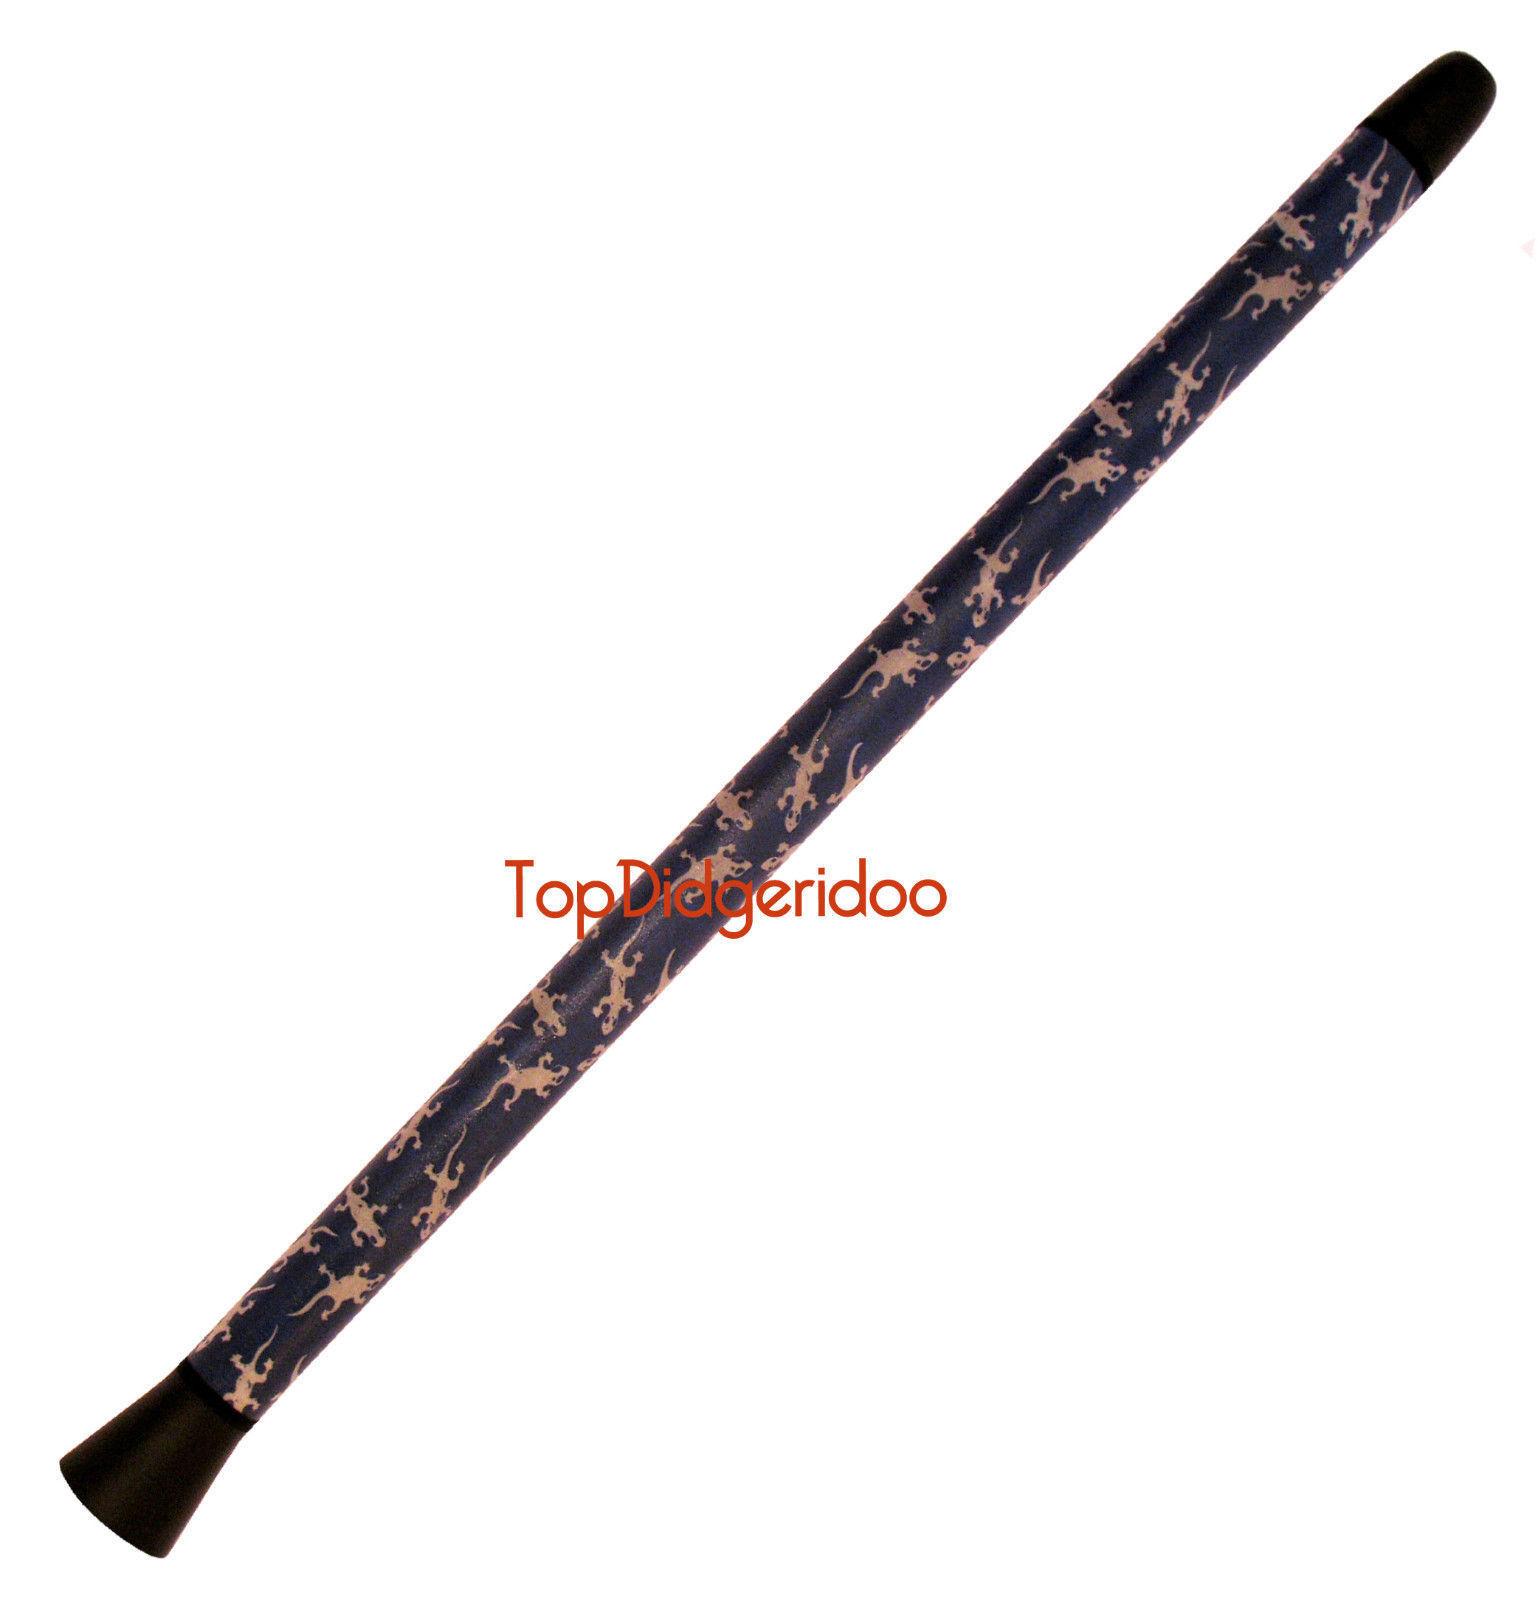 130cm\51  Long PVC Didgeridoo, Easy To Play, Loud Sound, Beautiful Modern Design